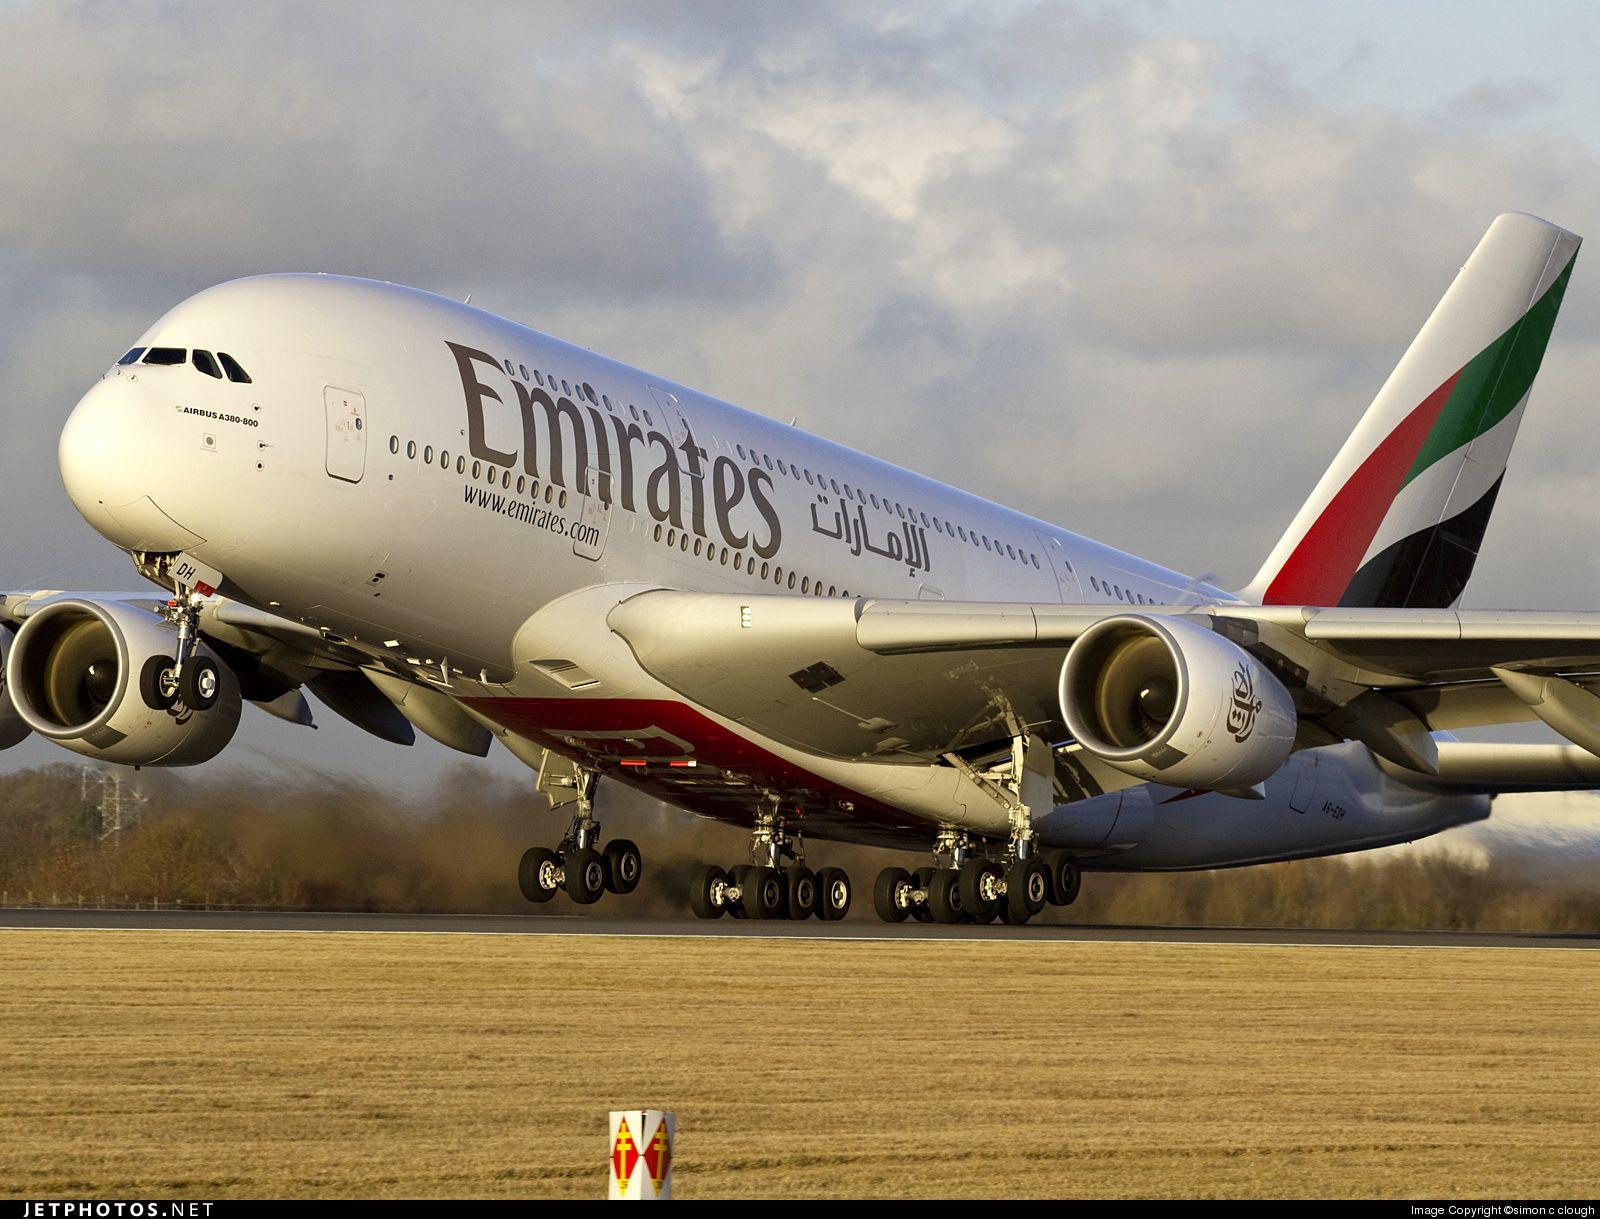 A380 Emirates Emirates Airline Emirates Airbus Aircraft